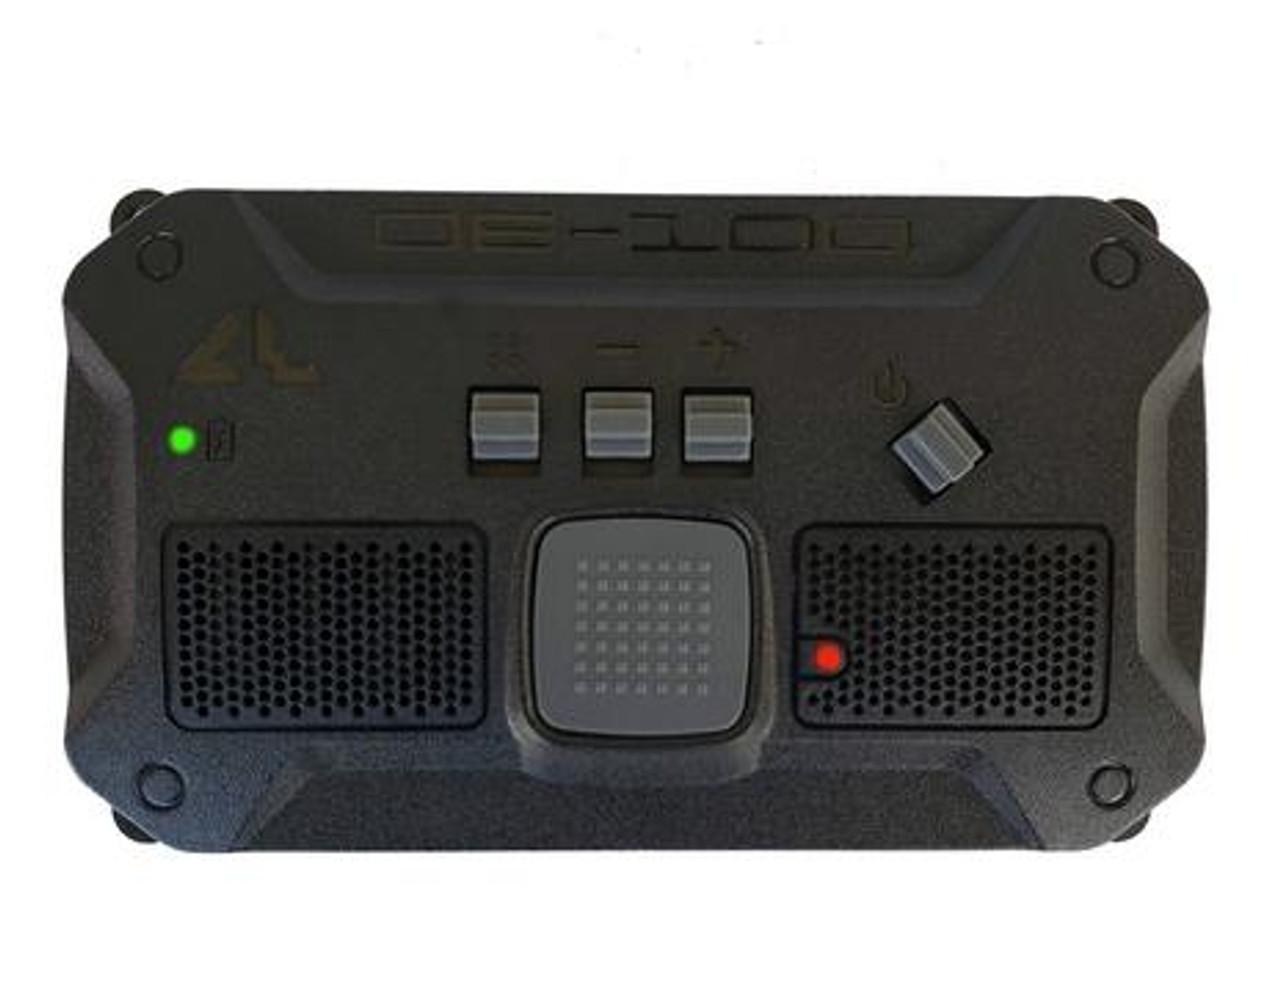 Cane Wireless DB-1060 Digital Base Station for Motorola DLR & DTR Series Radios